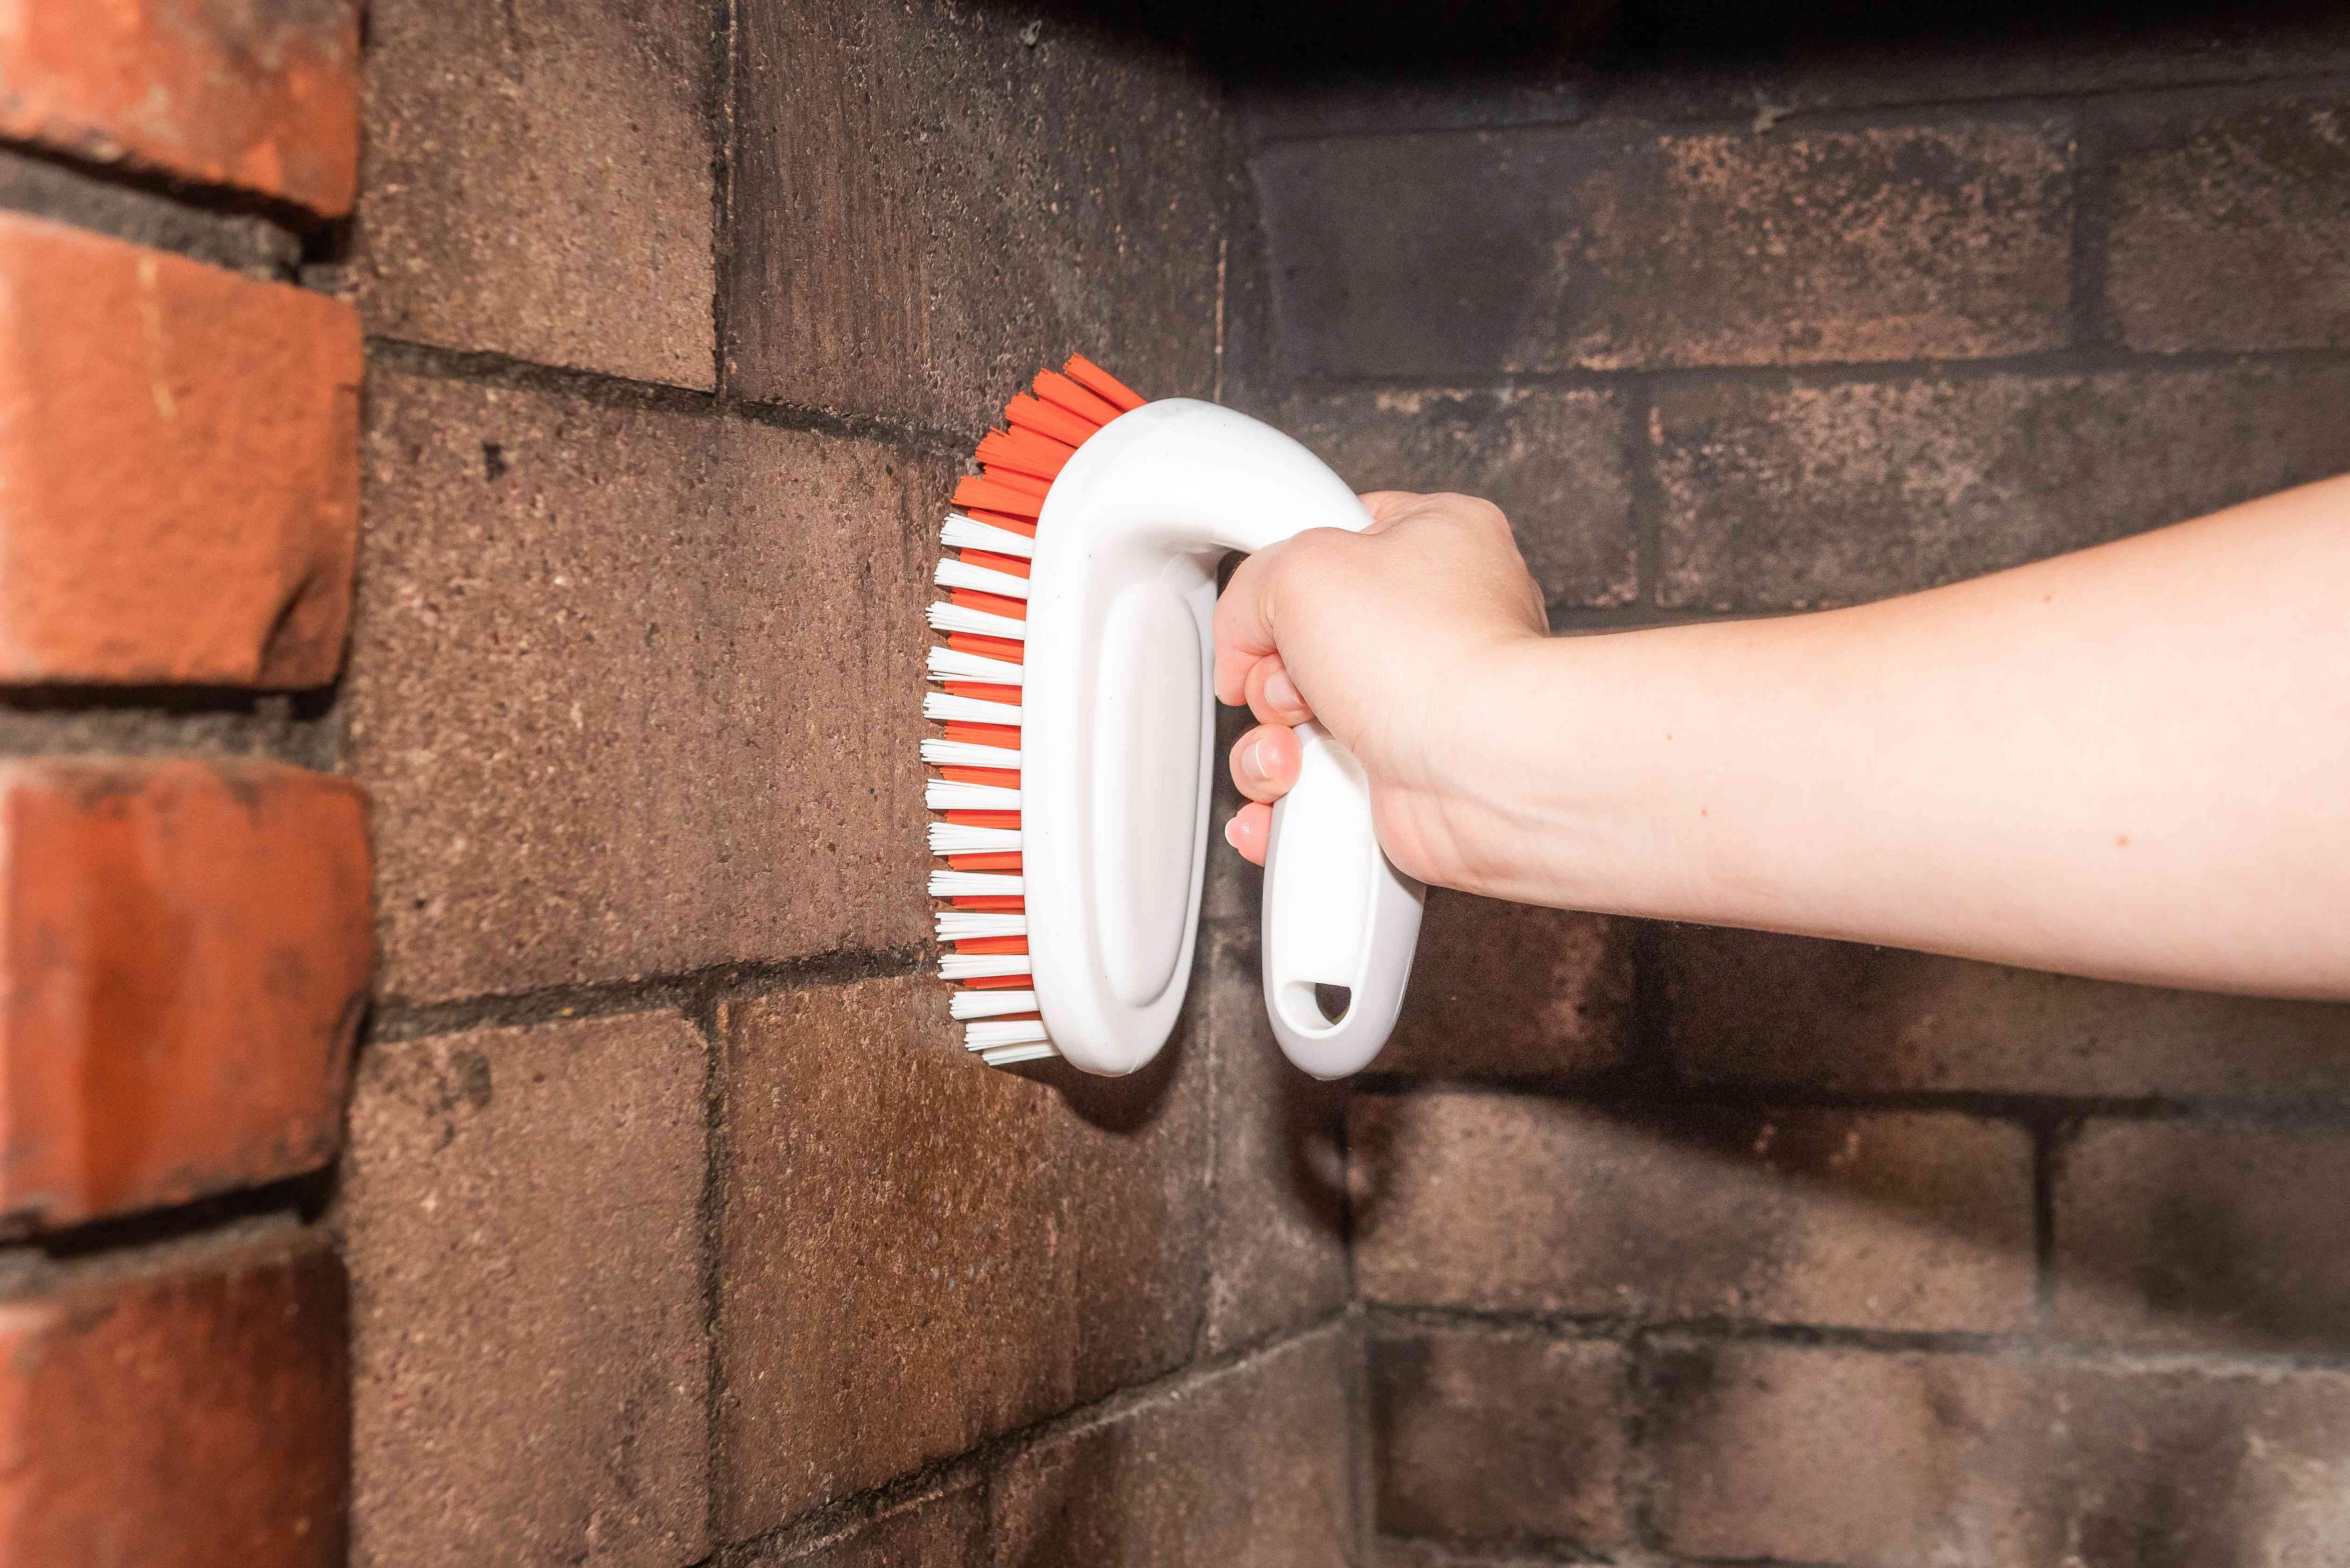 Scrub brush rubbing against fireplace walls